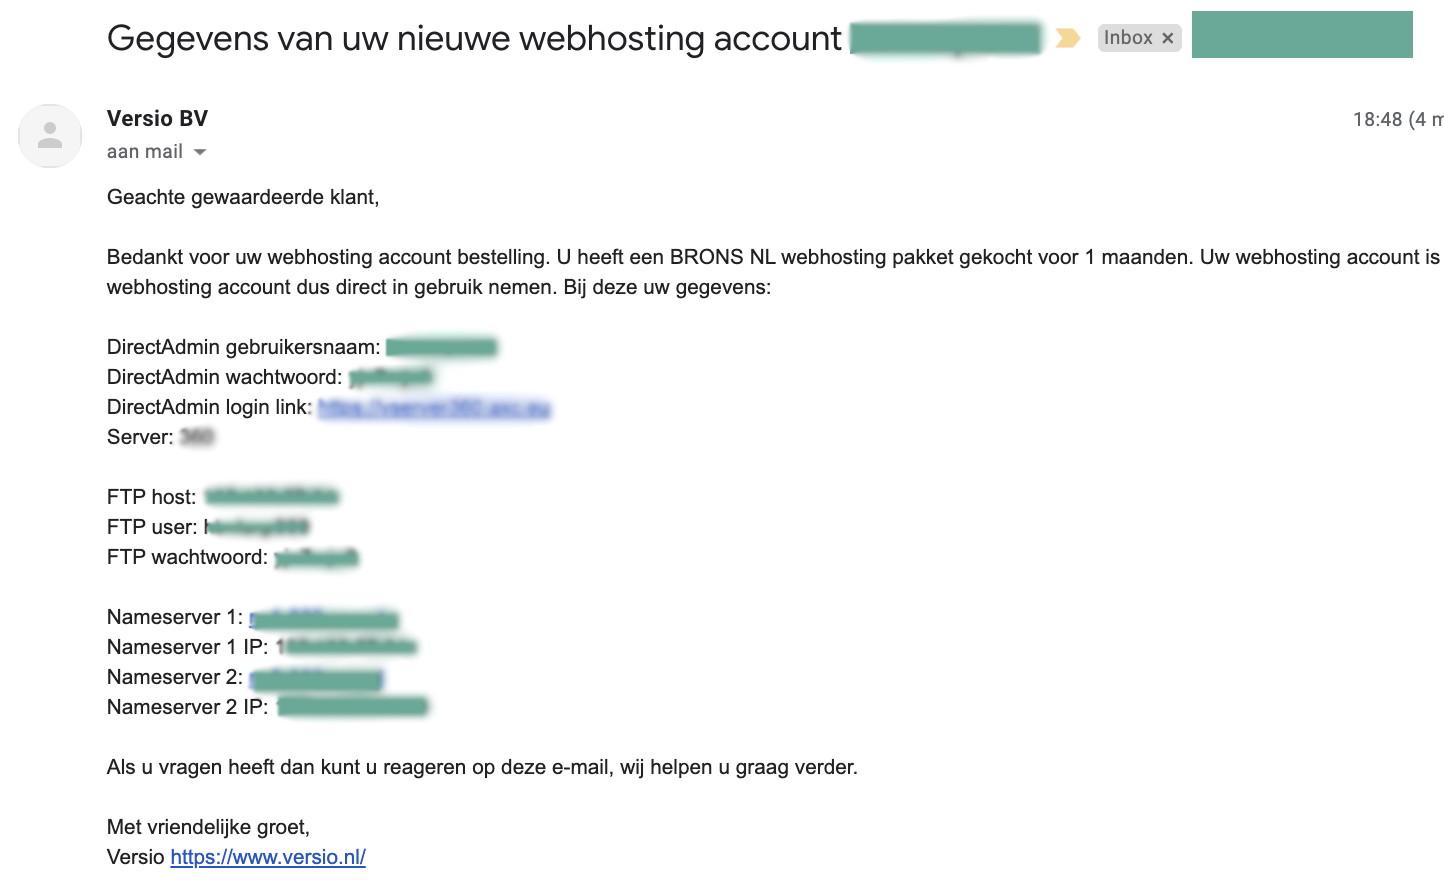 10 - gegevens in de mail